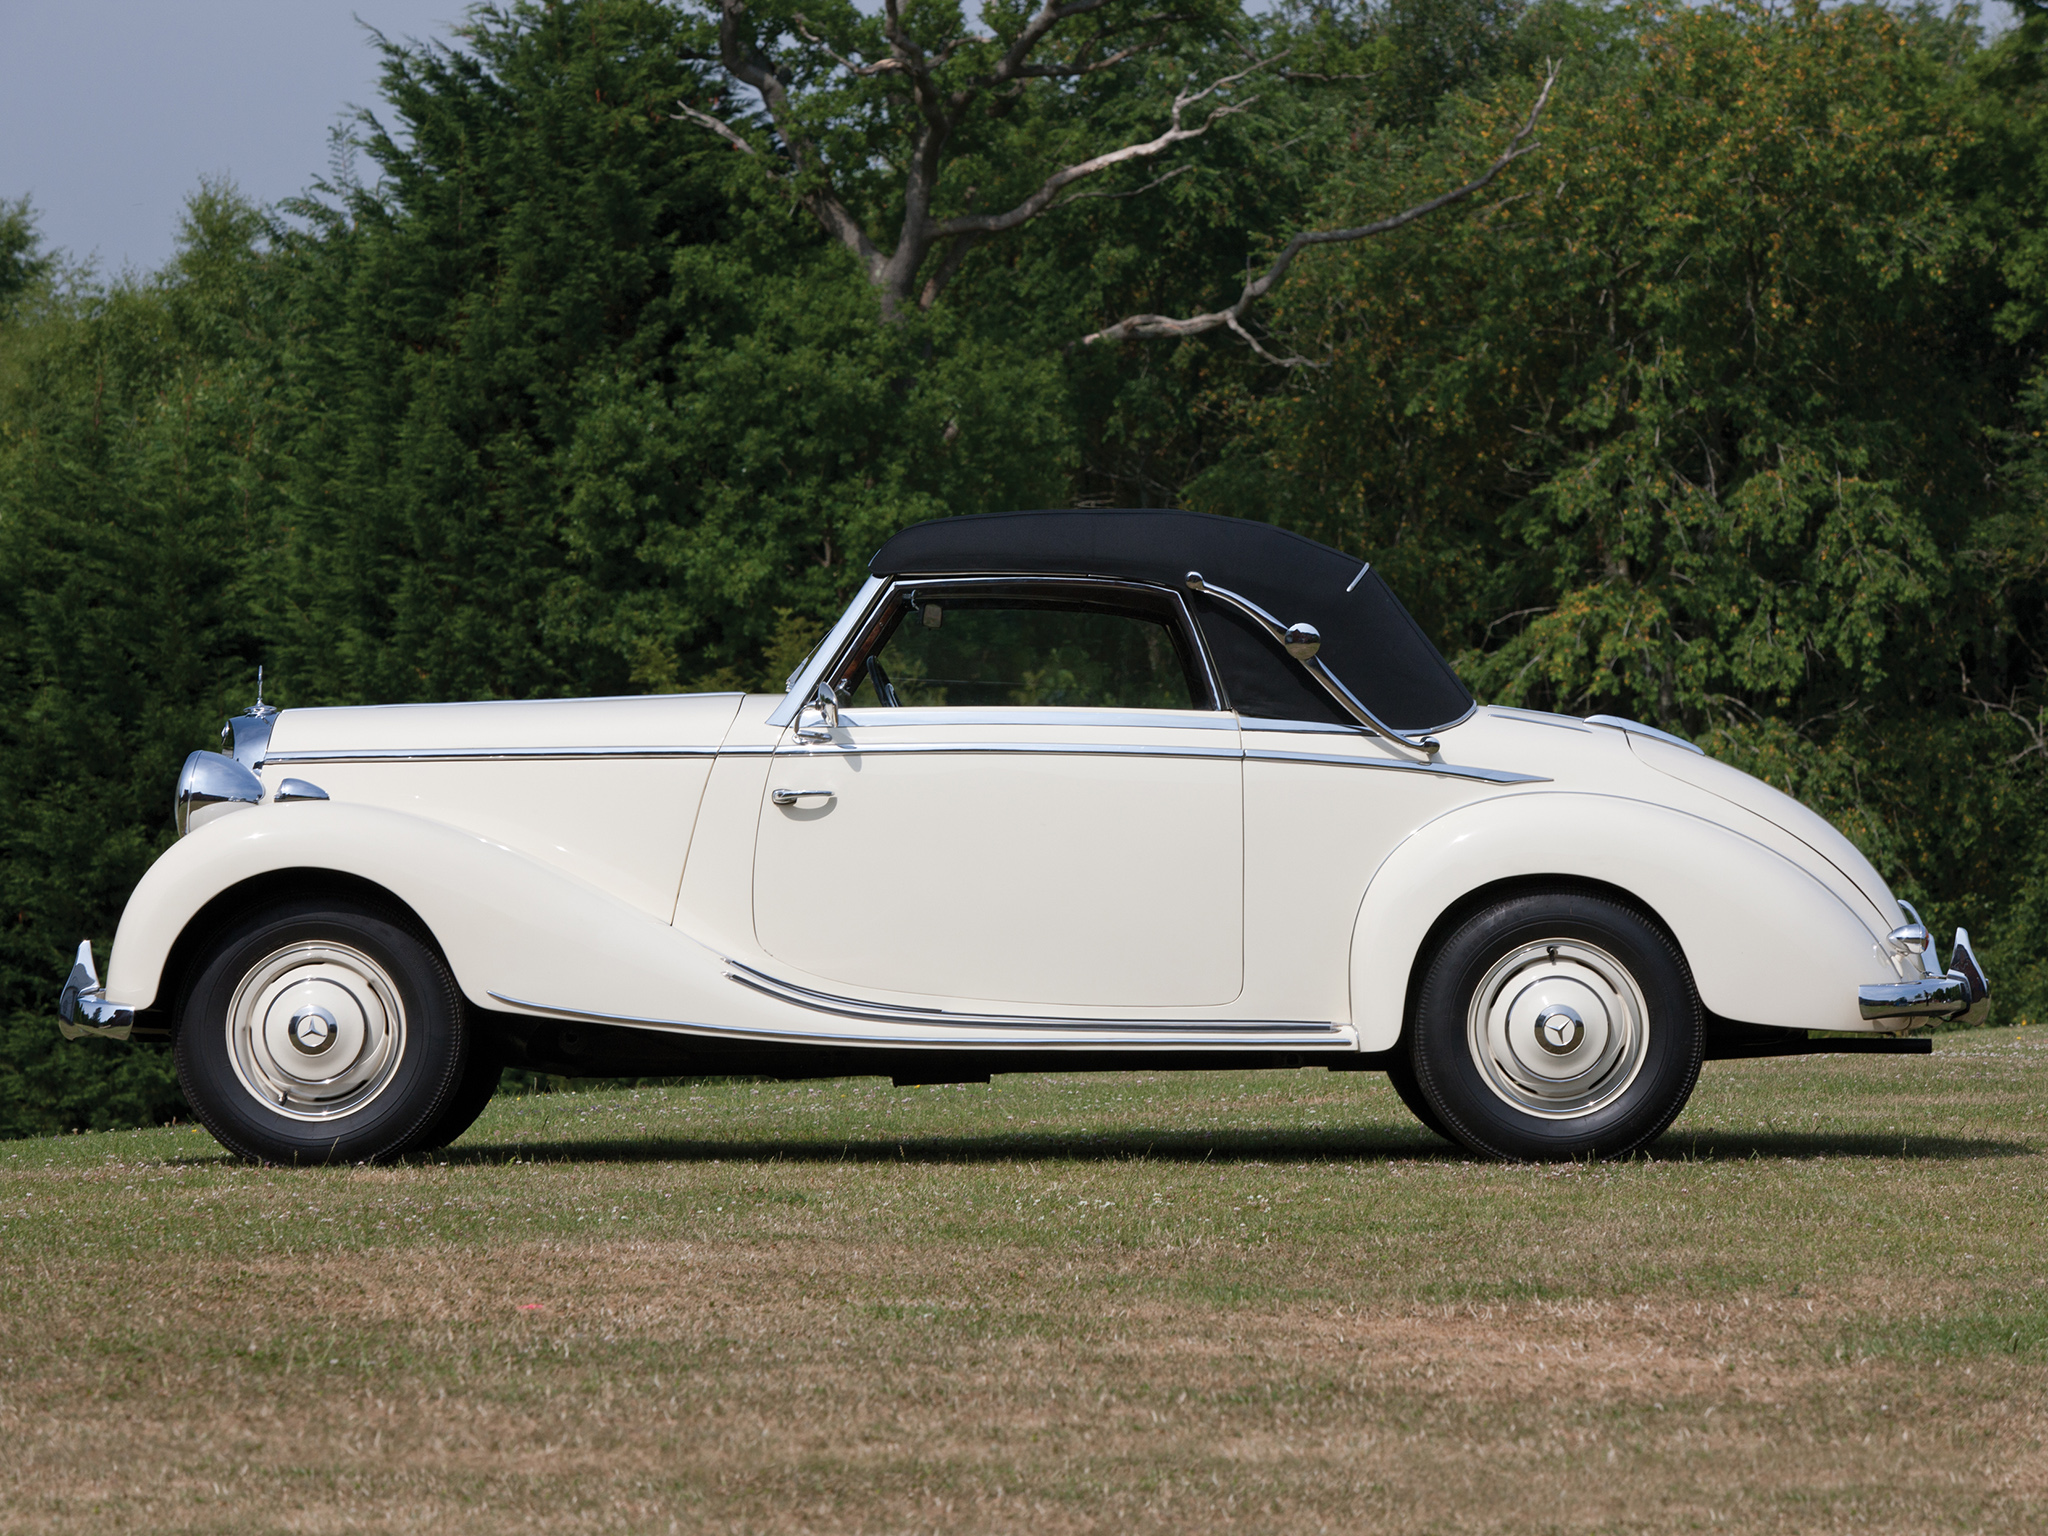 1949 mercedes benz 170 s cabriolet a w136iv retro luxury f for 1949 mercedes benz